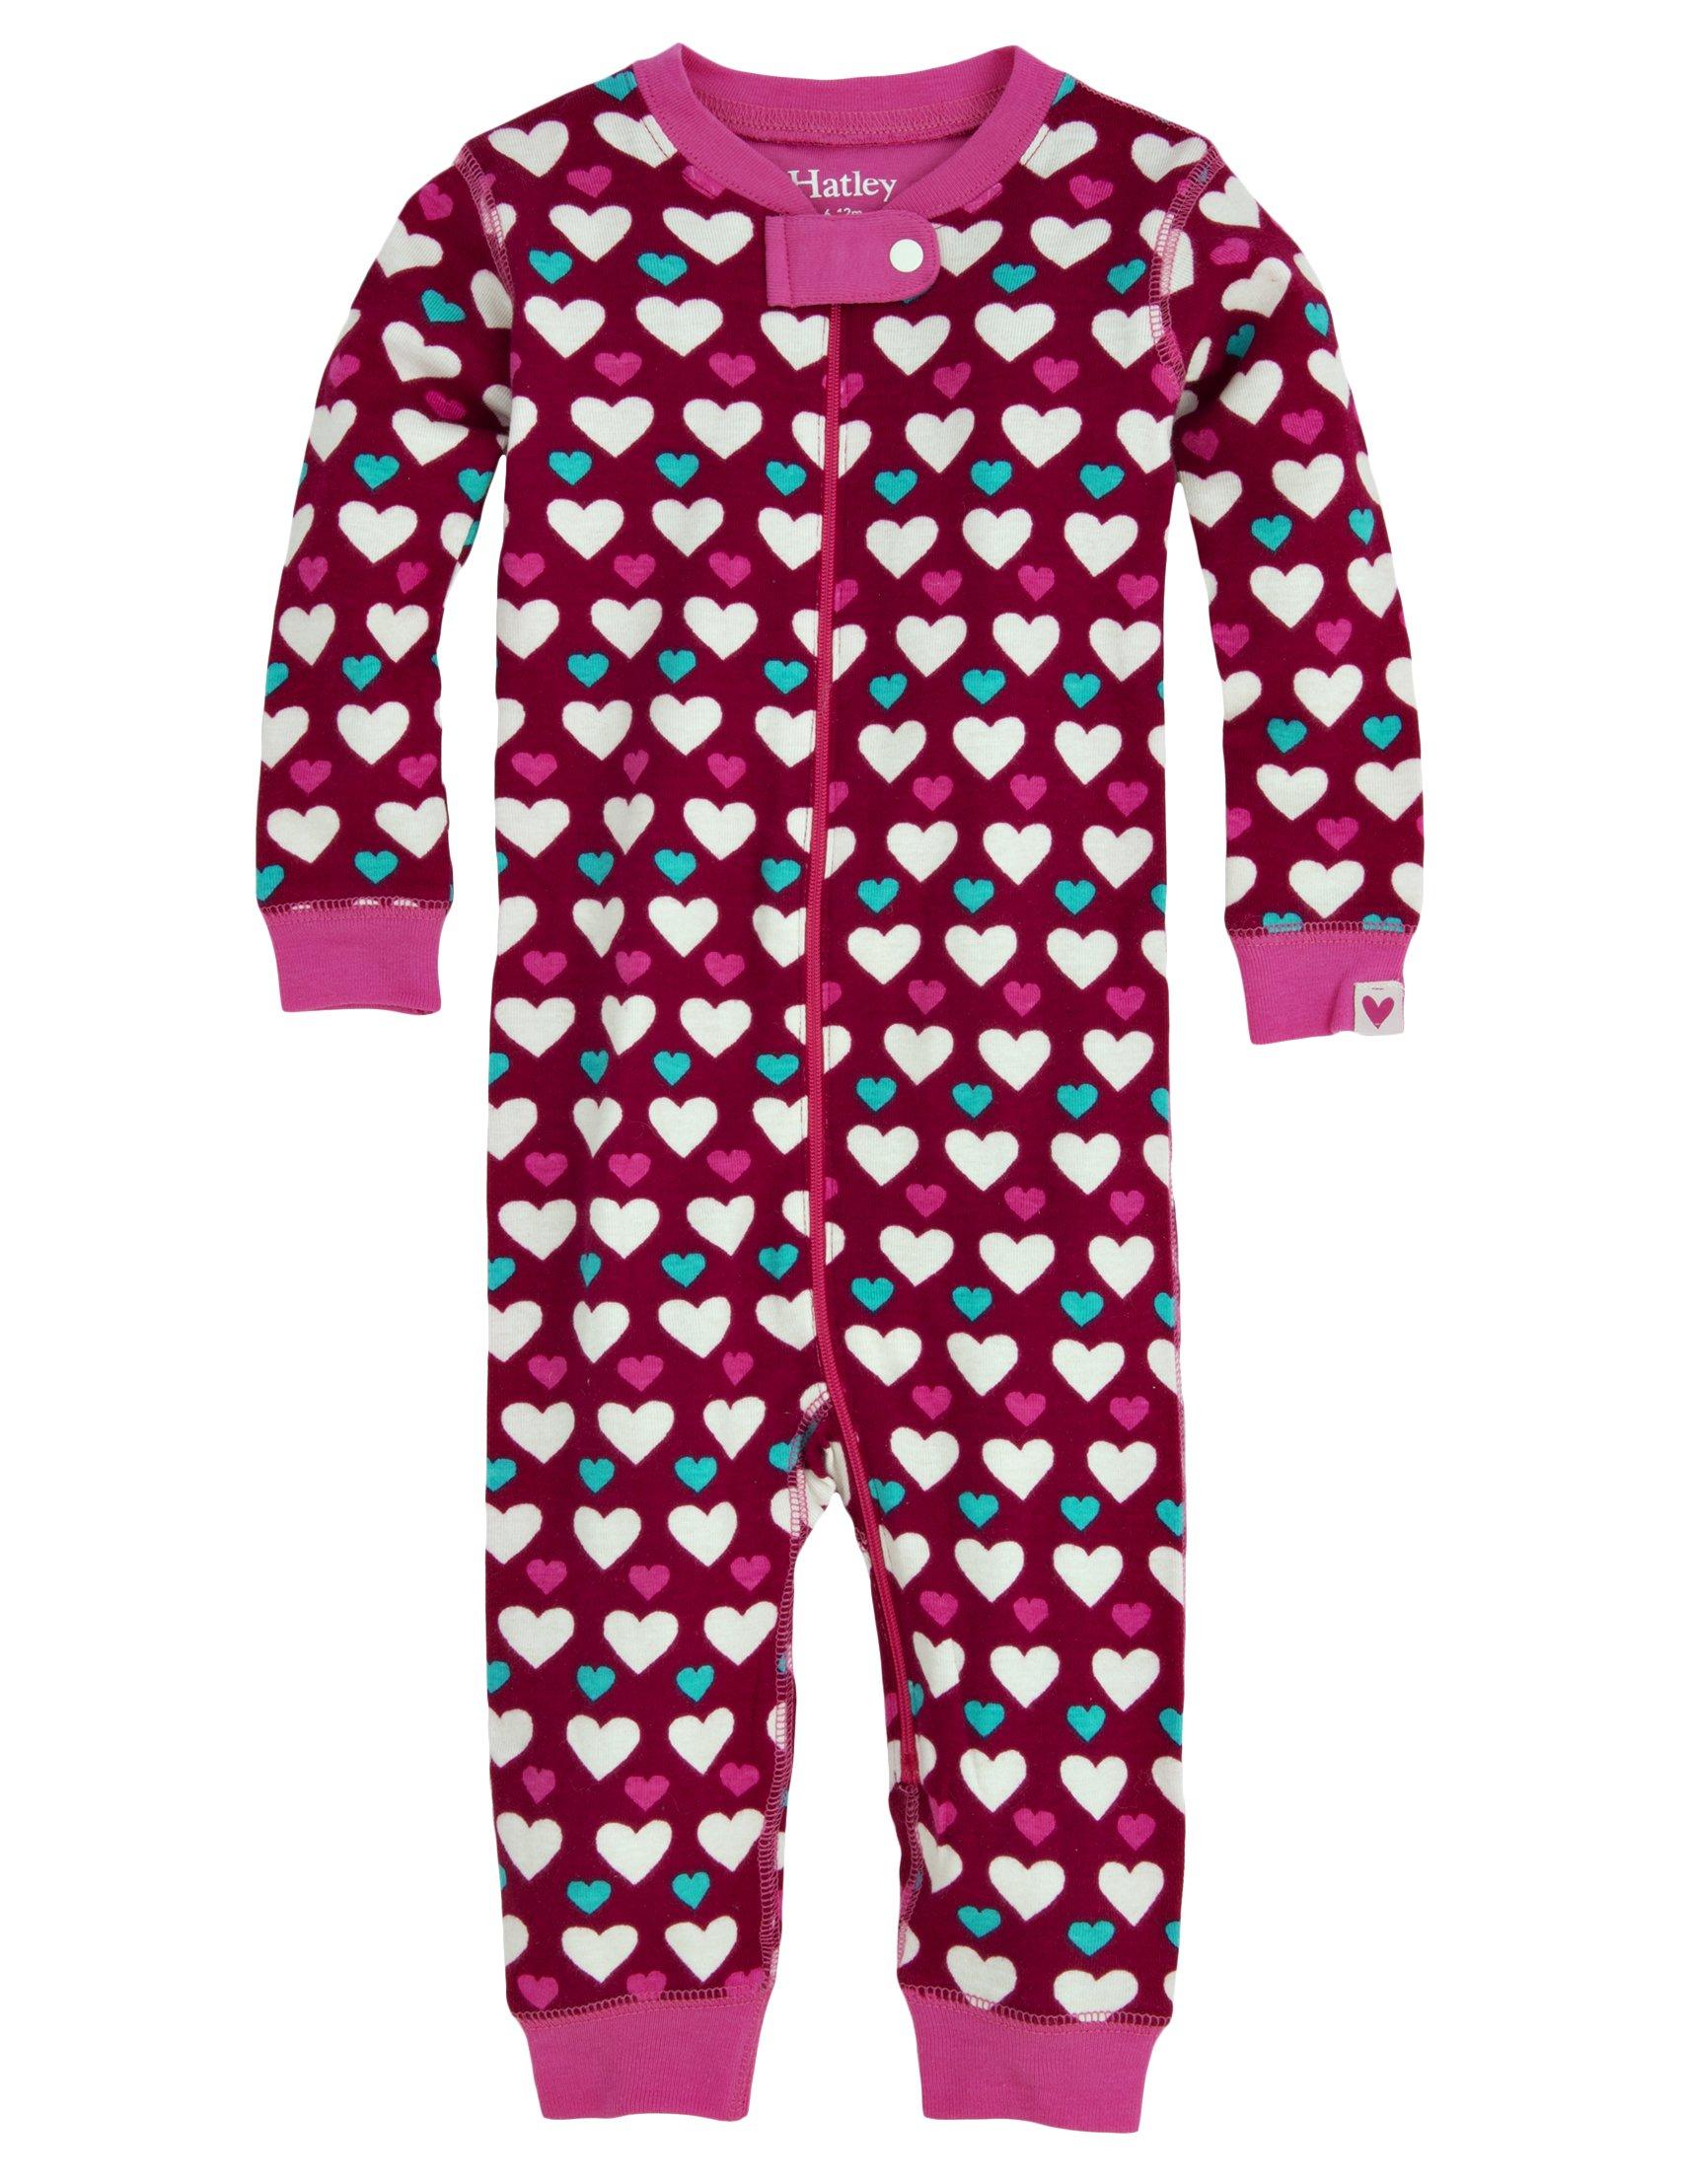 Hatley Baby Girls' Sleepy Romper Lots Of hearts, Red, 12 18 Months